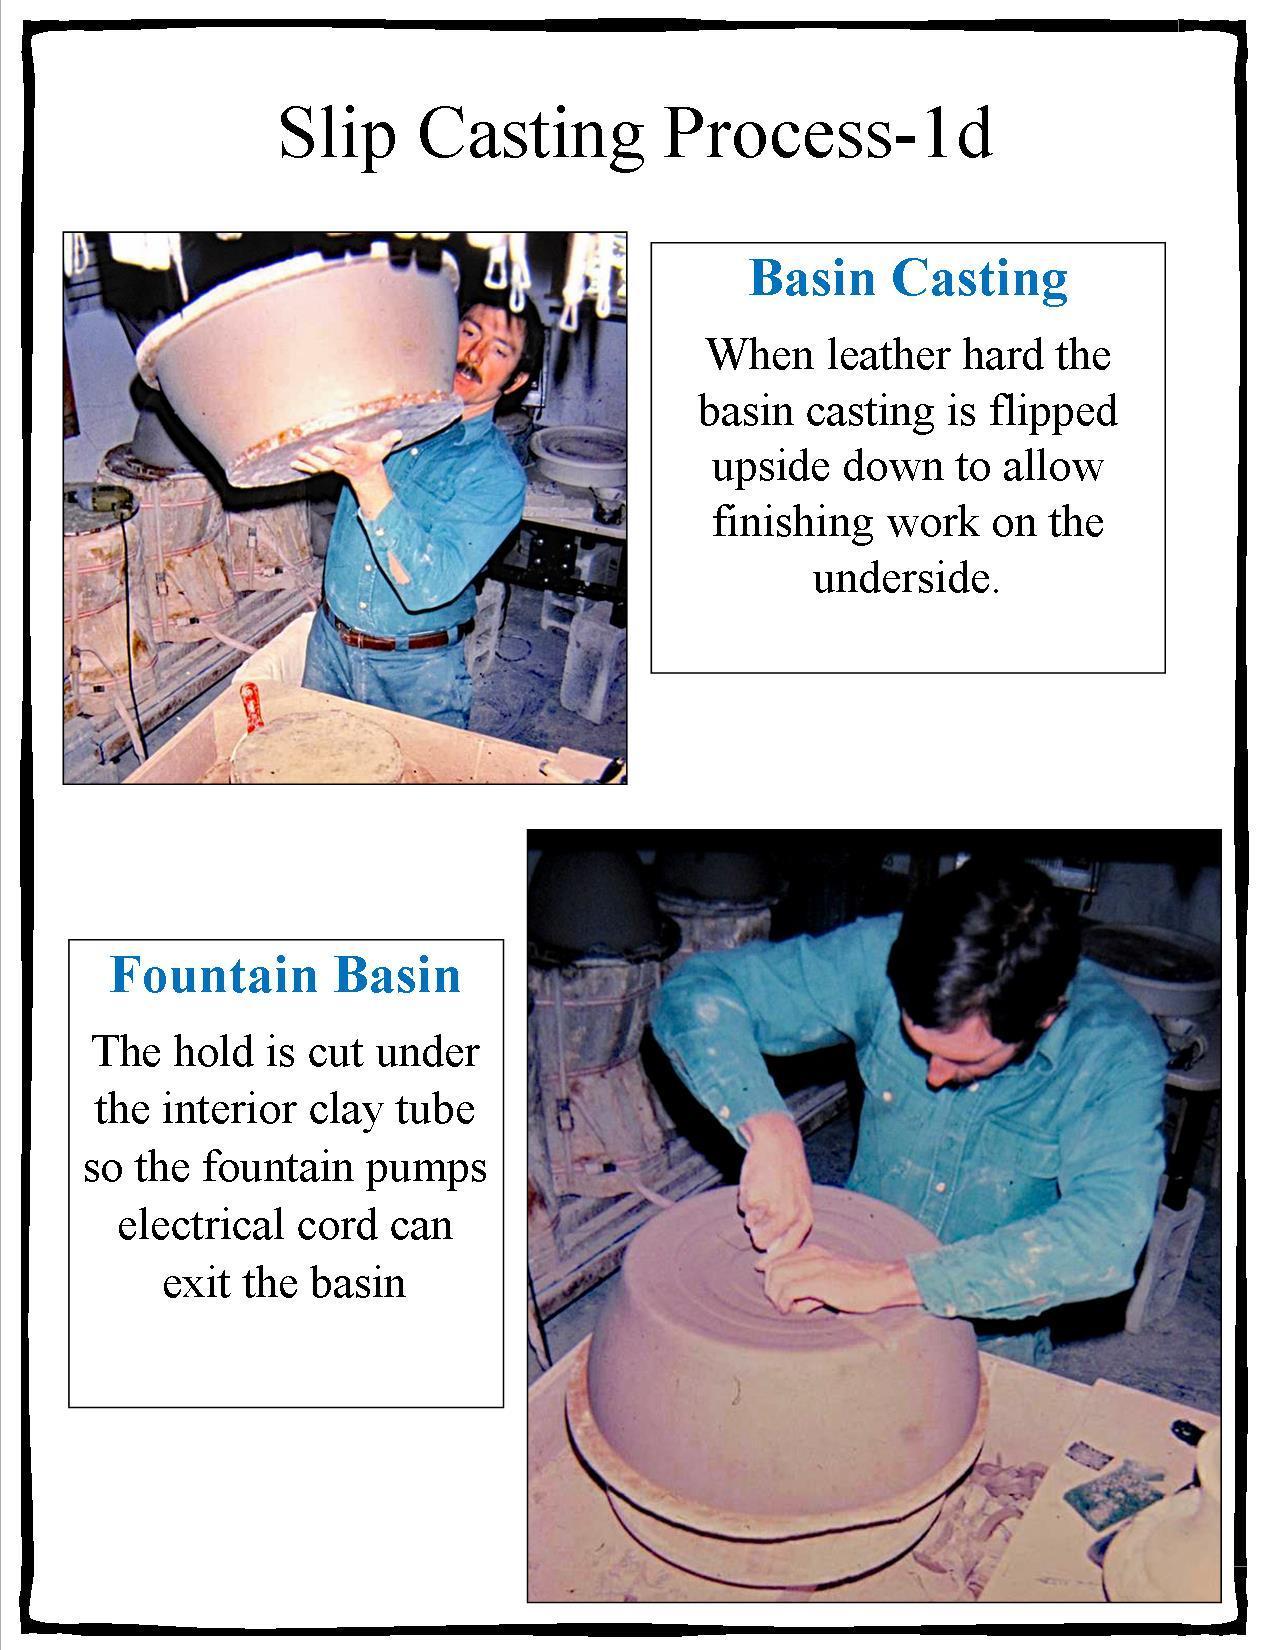 Slip Casting Process-1d